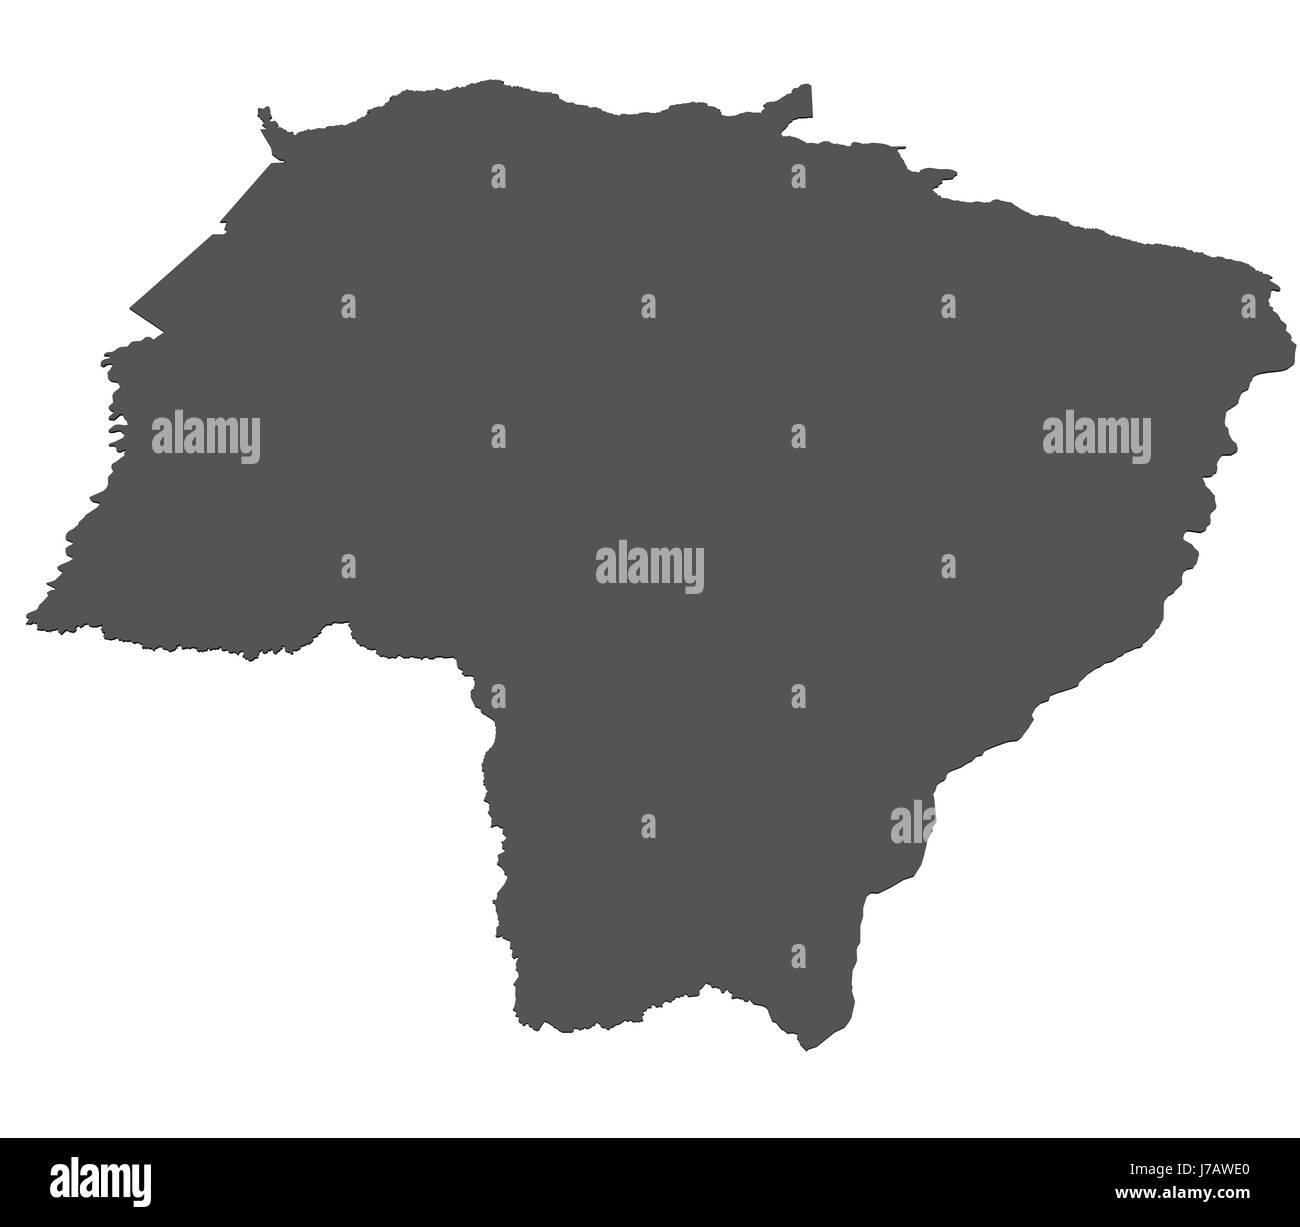 america brazil card atlas map of the world map optional illustration portugal Stock Photo